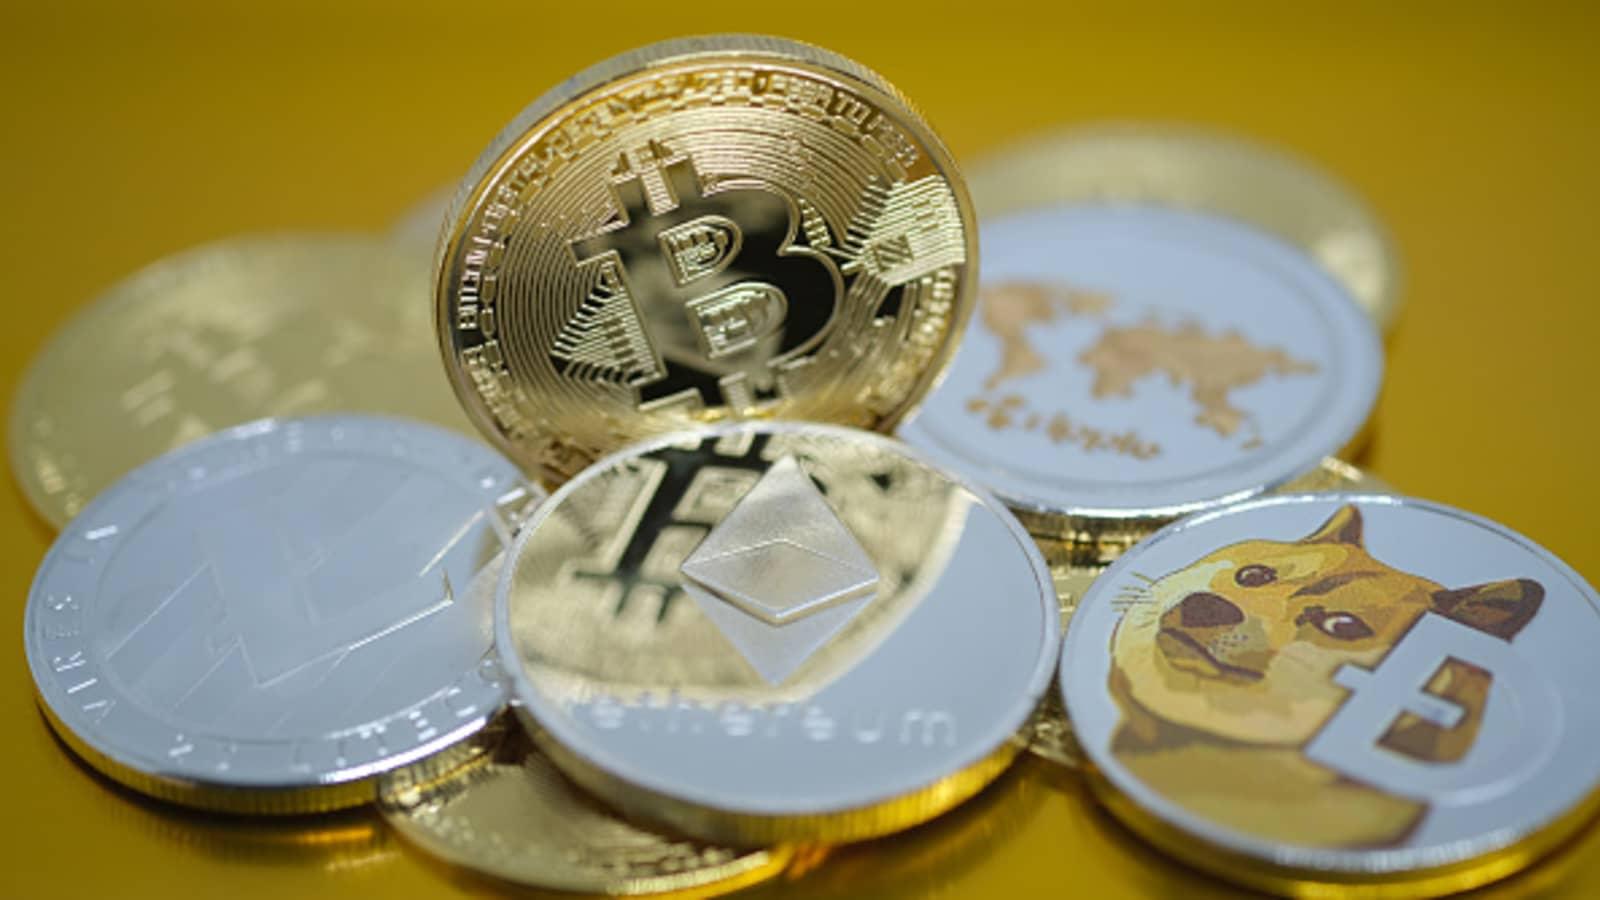 Bitcoins and Dogecoin